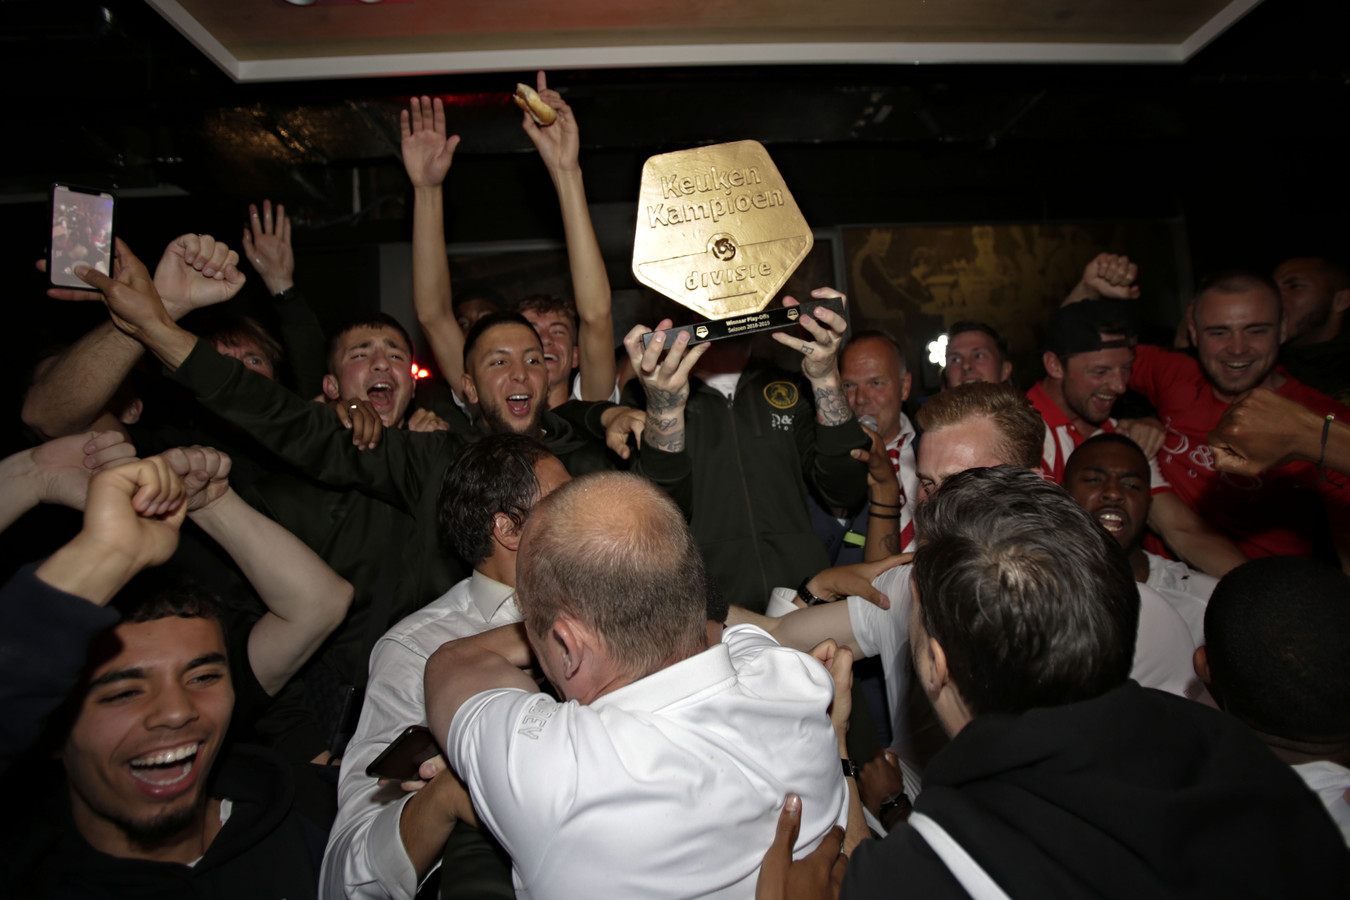 Dolle vreugde na de wedstrijd  De Graafschap - Sparta Rotterdam in de Jupiler Lounge